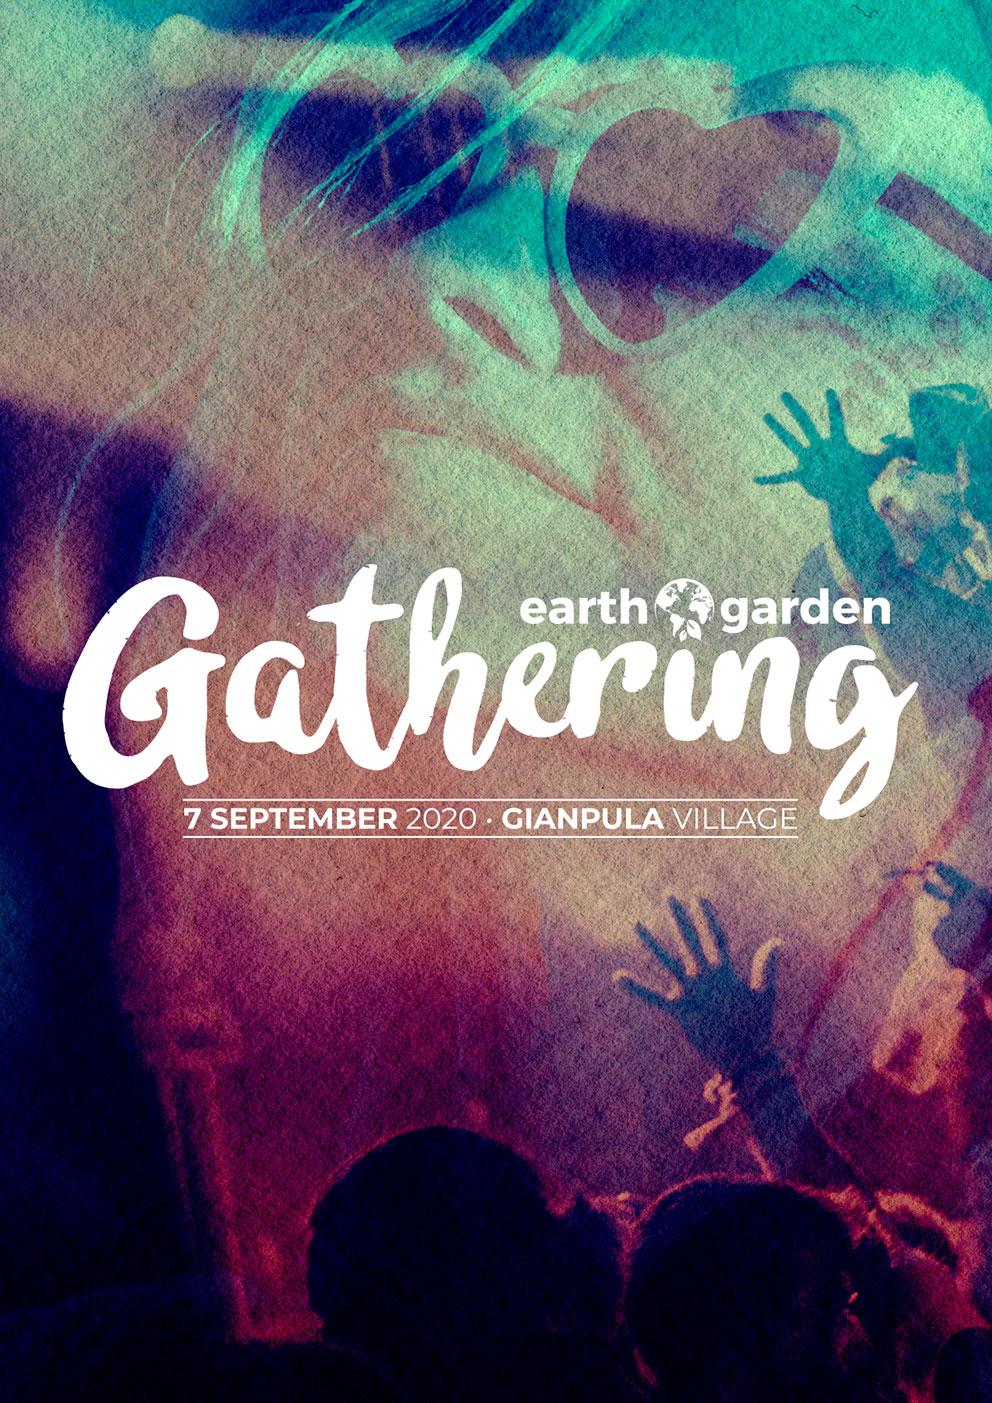 Earth Garden Gathering flyer